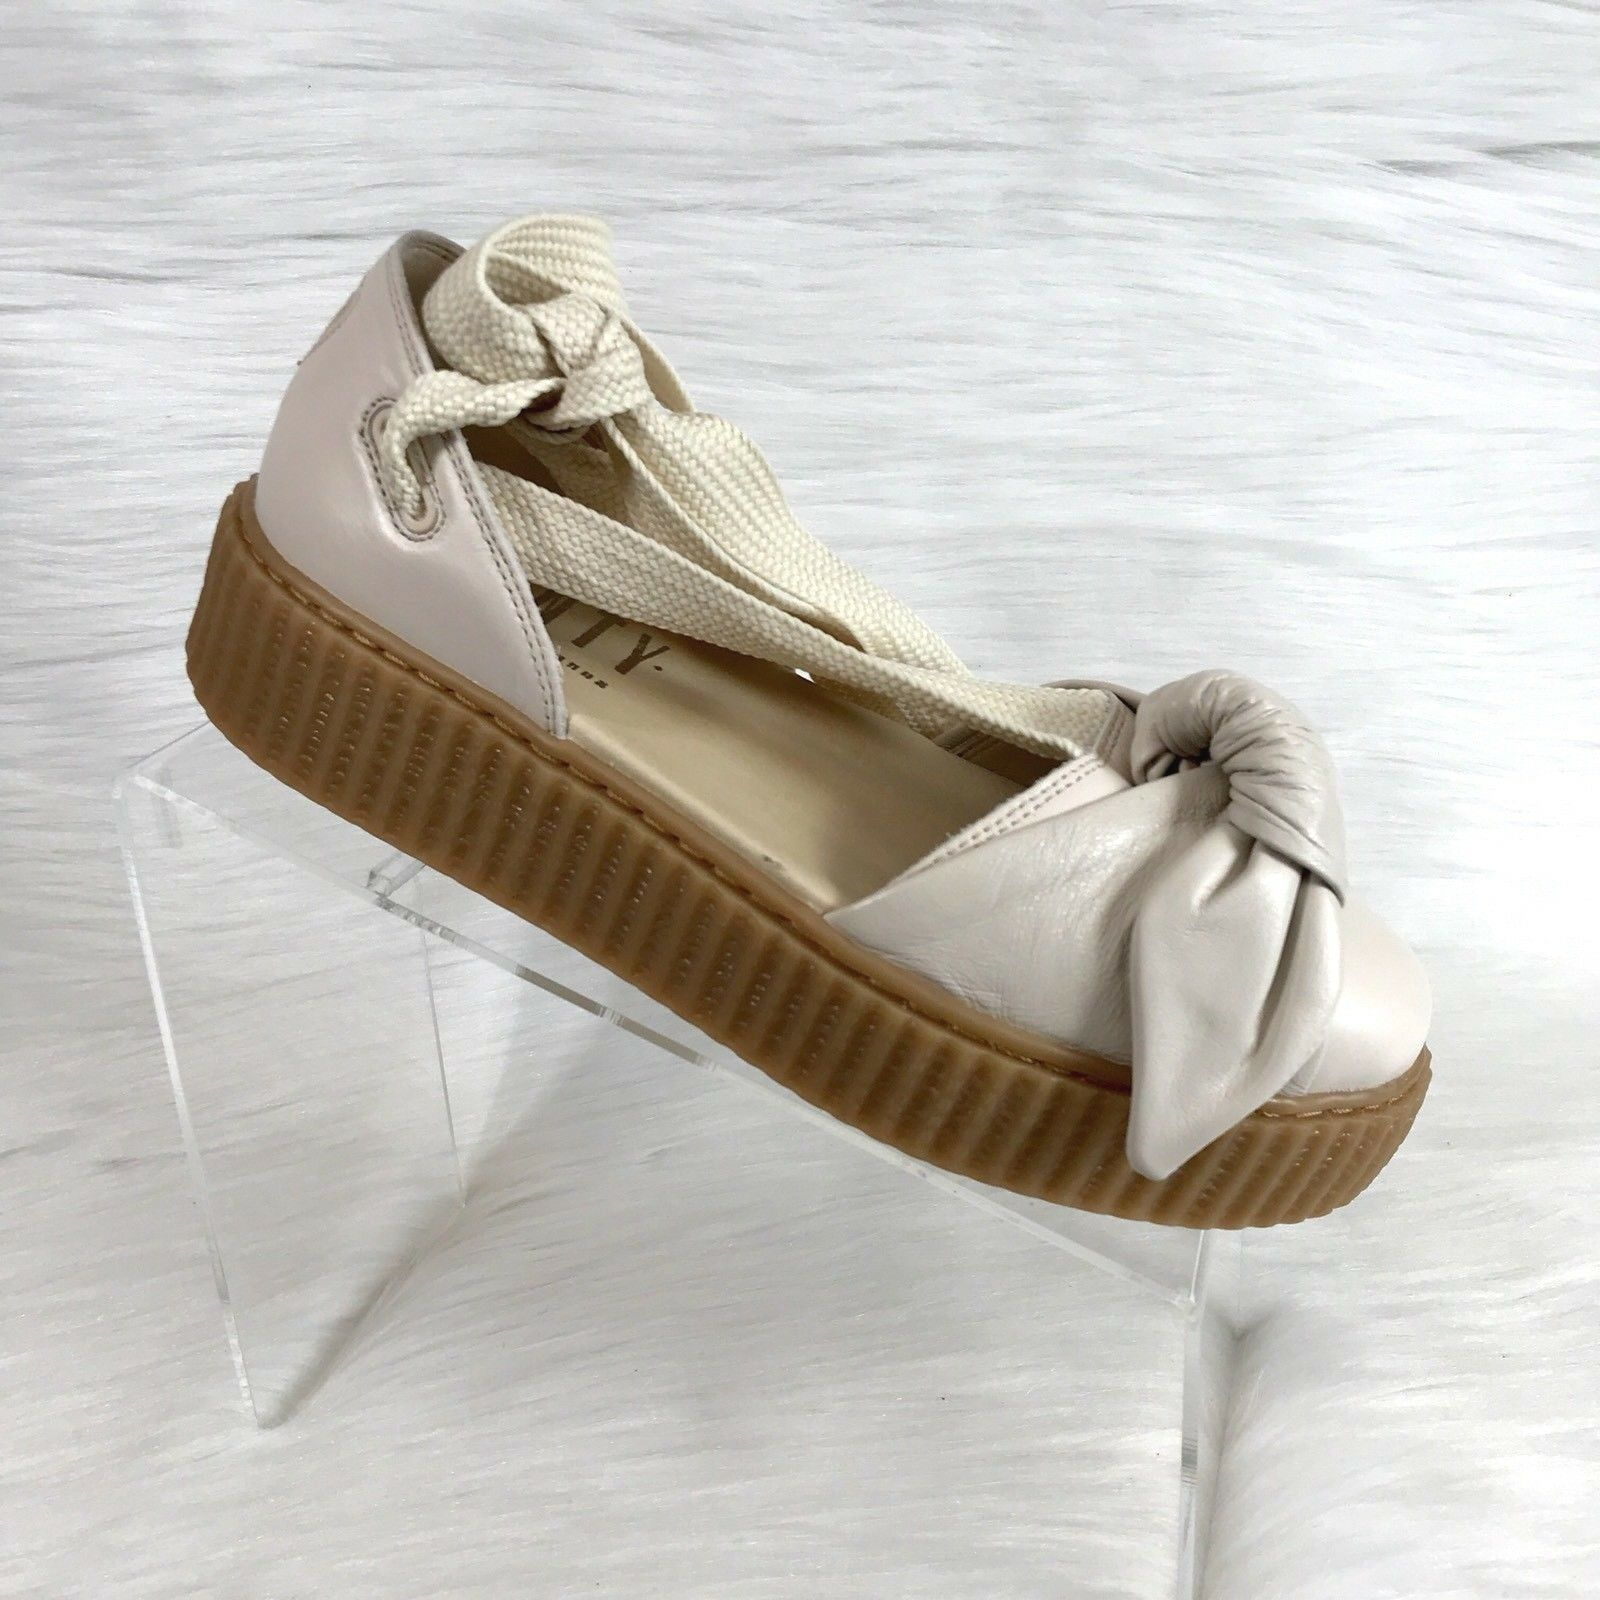 Fenty Puma X  Beige Rihanna Bow Creeper Sandales Beige  Leder Größe 8.5 New f42191